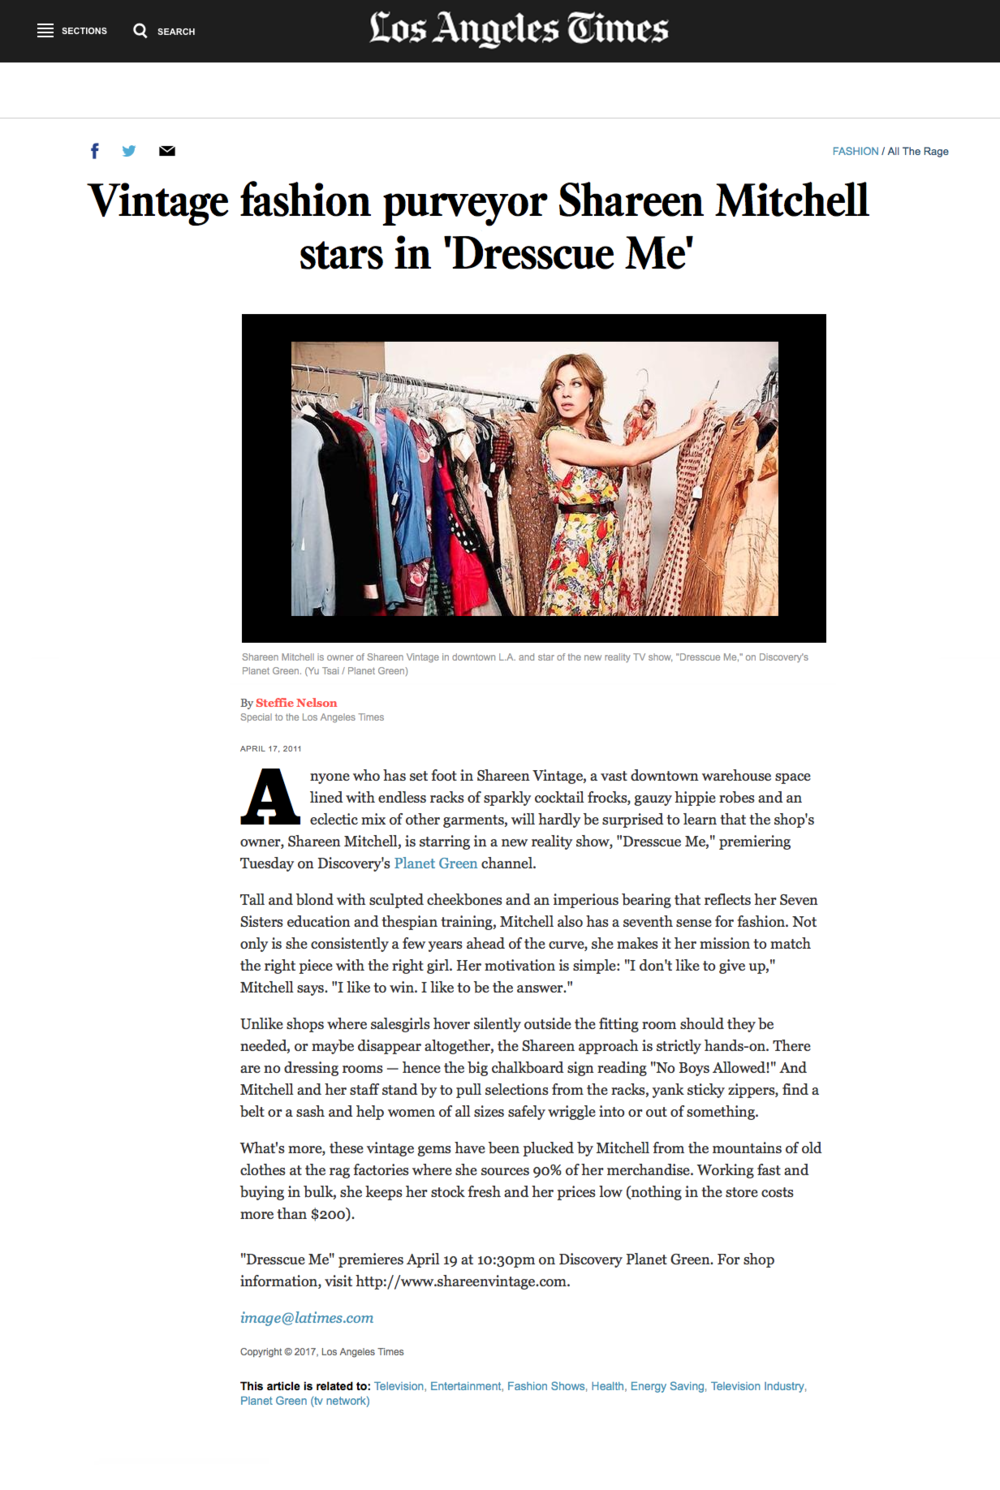 http://www.latimes.com/fashion/alltherage/la-ig-shareen-20110417-story.html